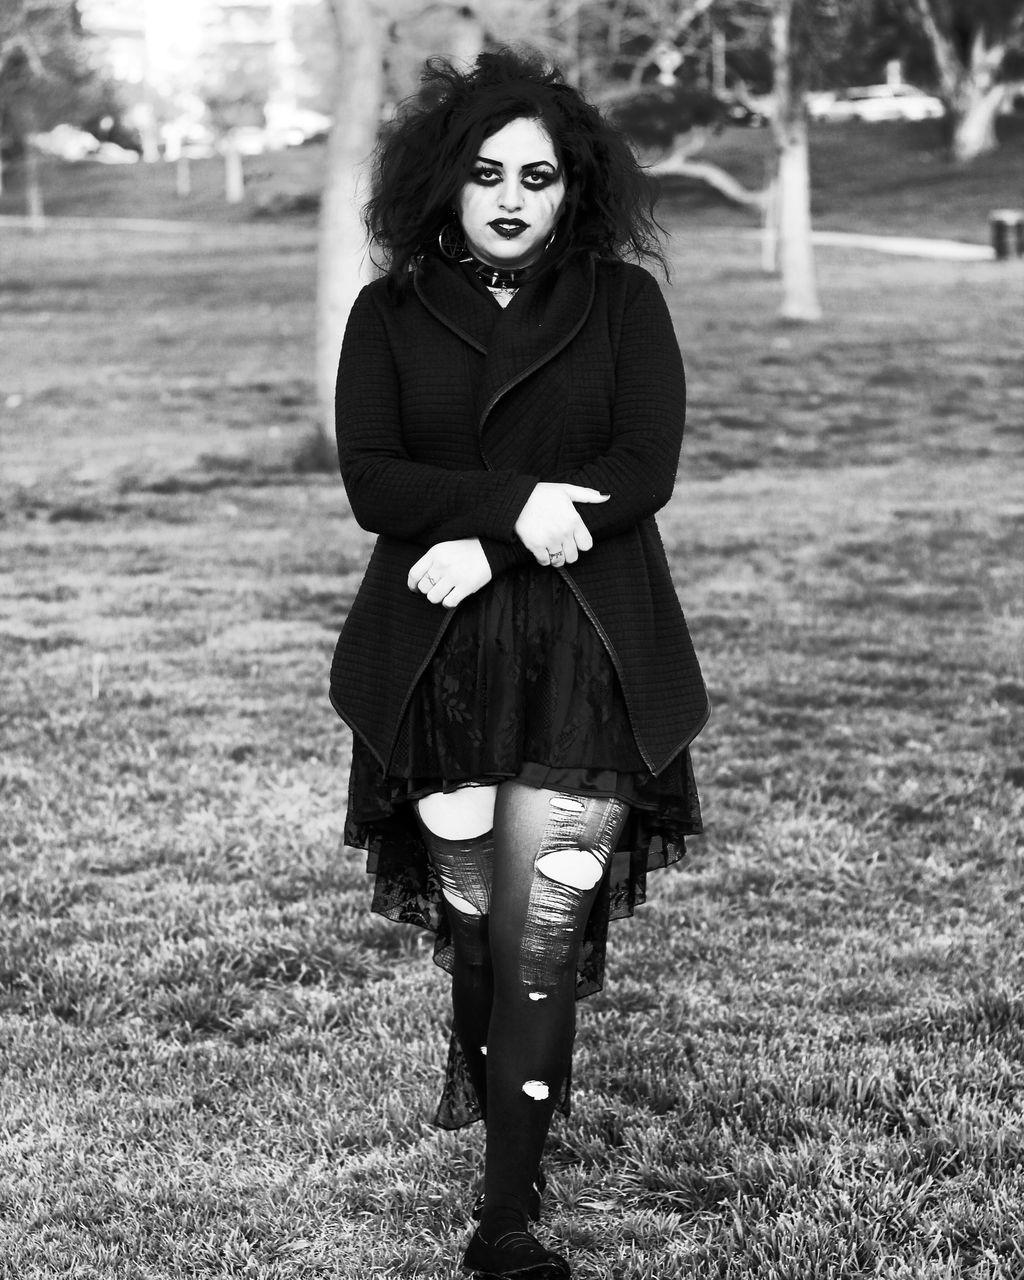 Portrait Of Gothic Woman Walking On Grassy Field